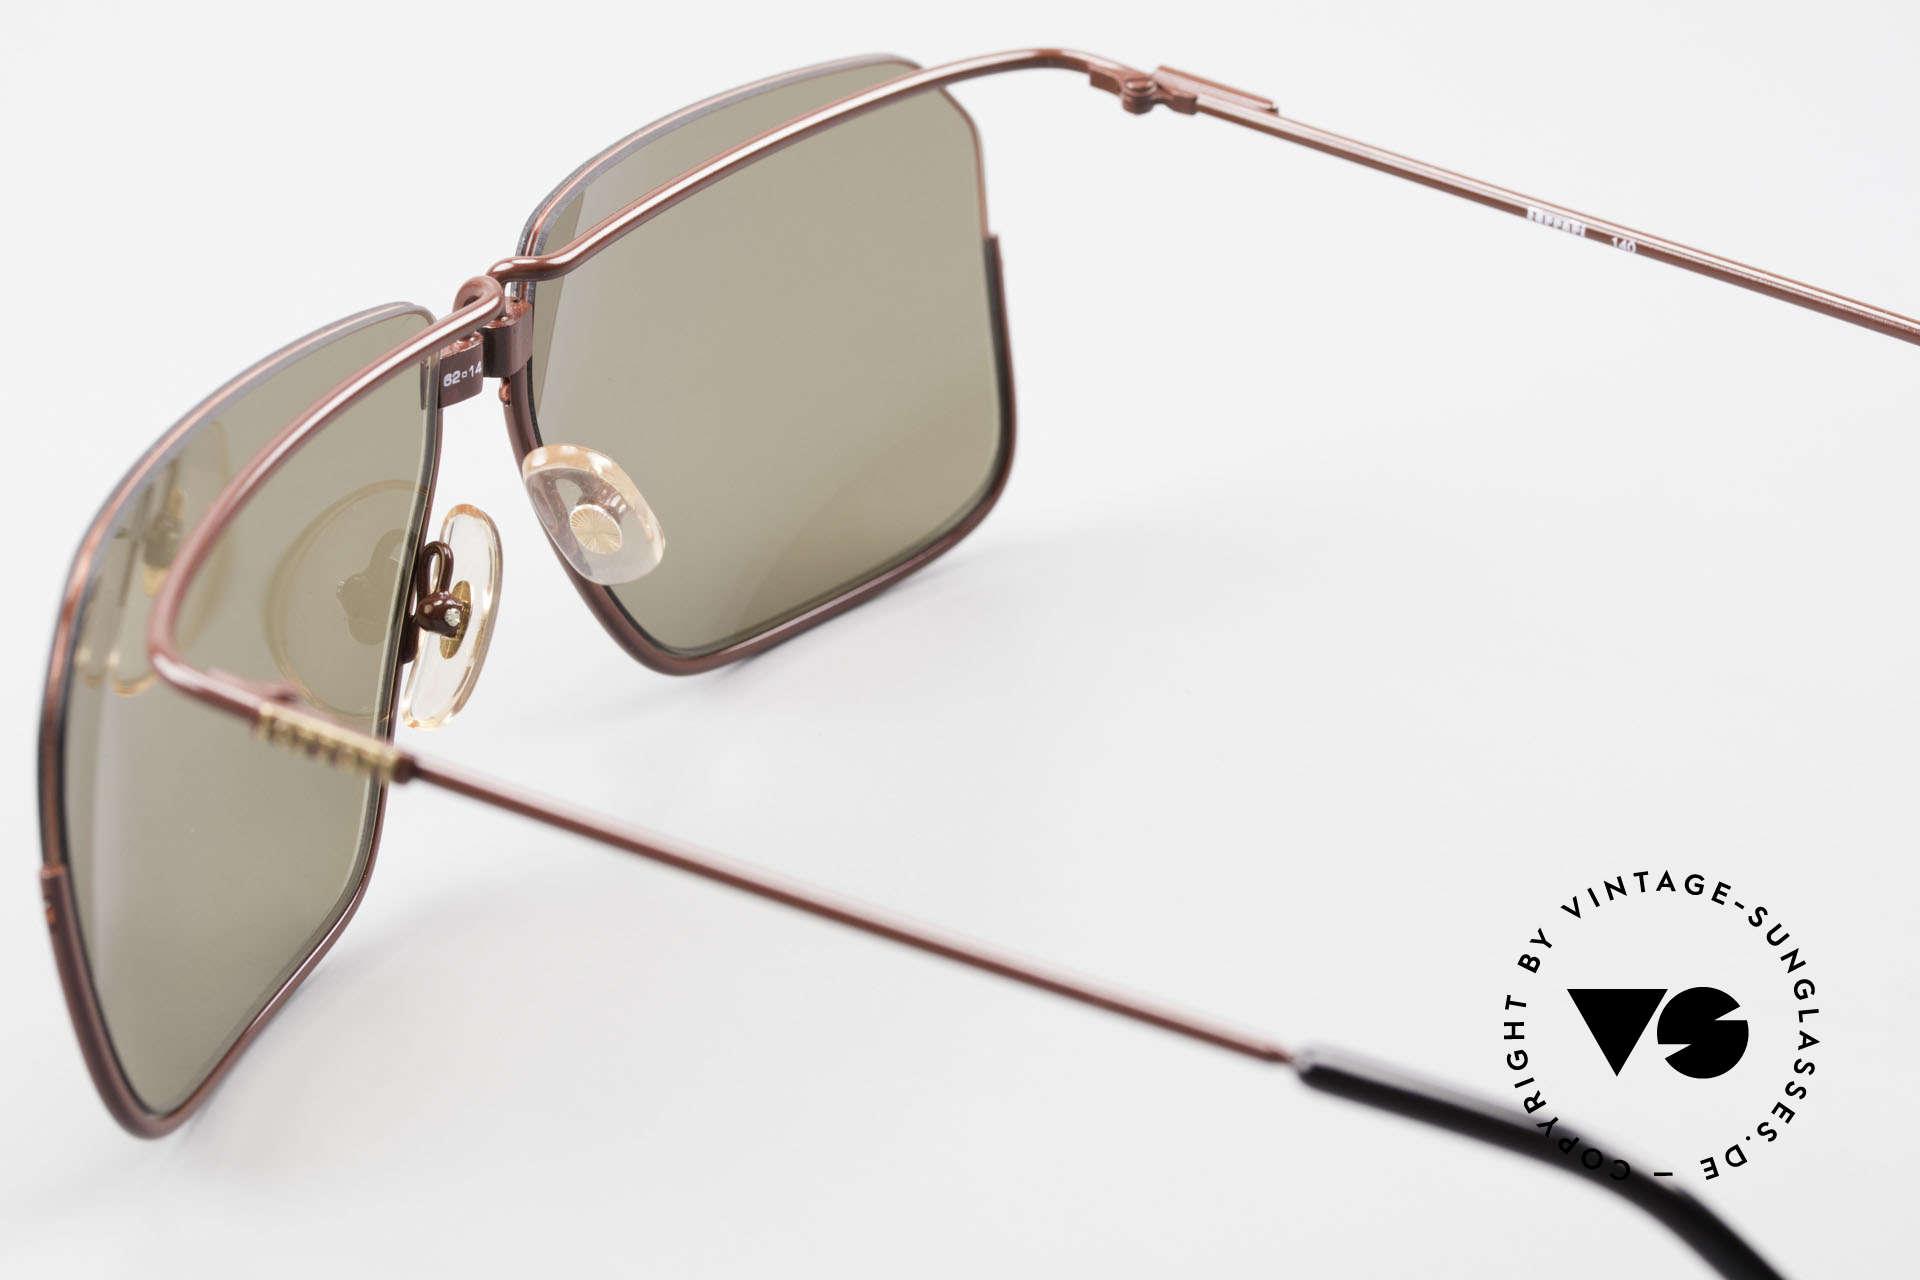 Ferrari F18/S Ferrari Formula 1 Sunglasses, Size: medium, Made for Men